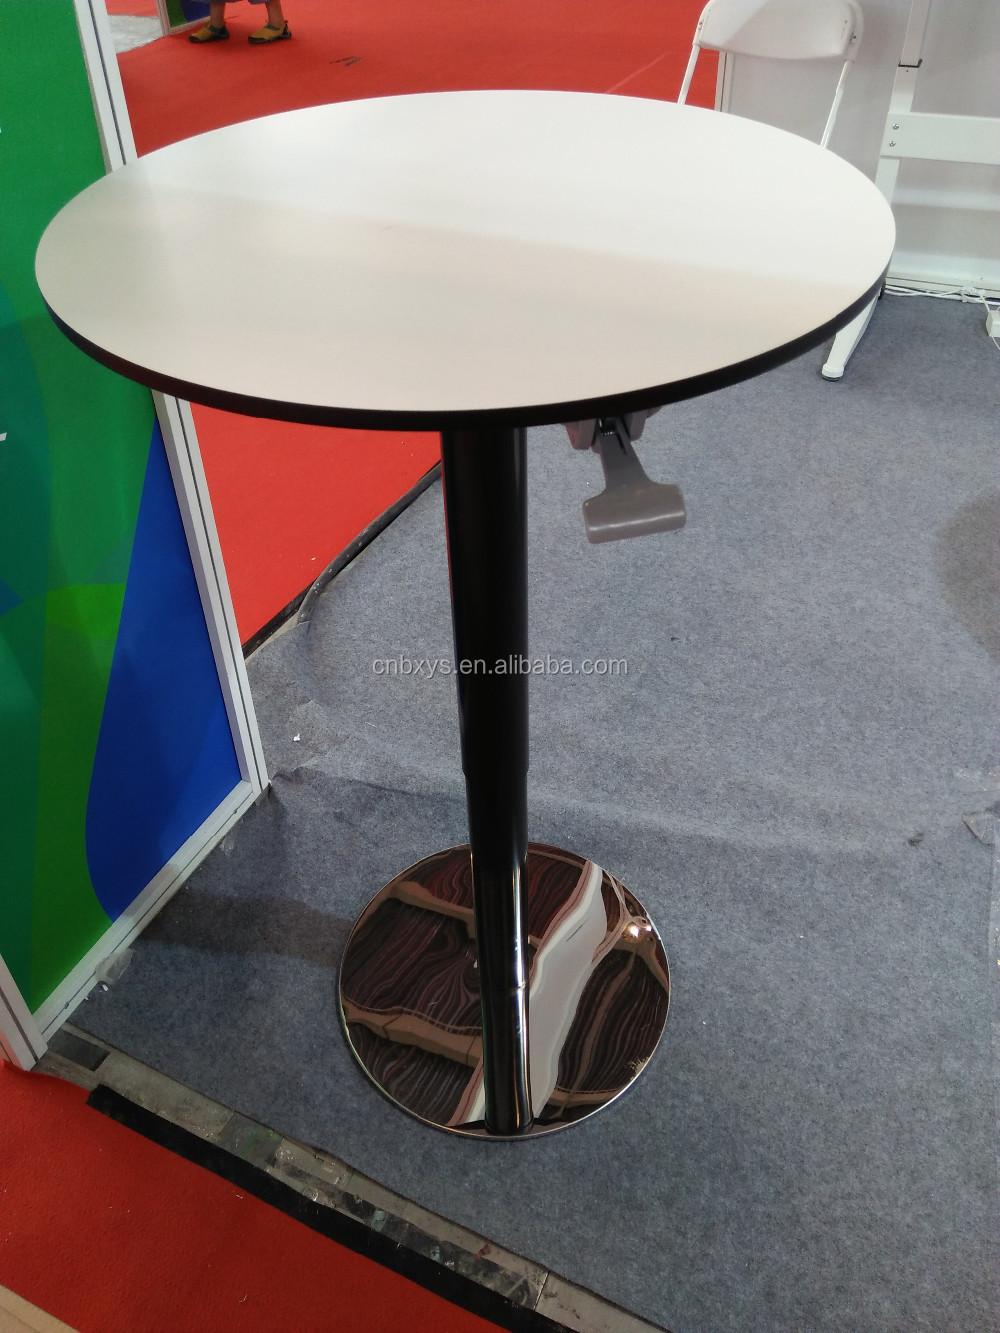 Strange Adjustable Height Dining Table Ikea Adjustable Height Theyellowbook Wood Chair Design Ideas Theyellowbookinfo